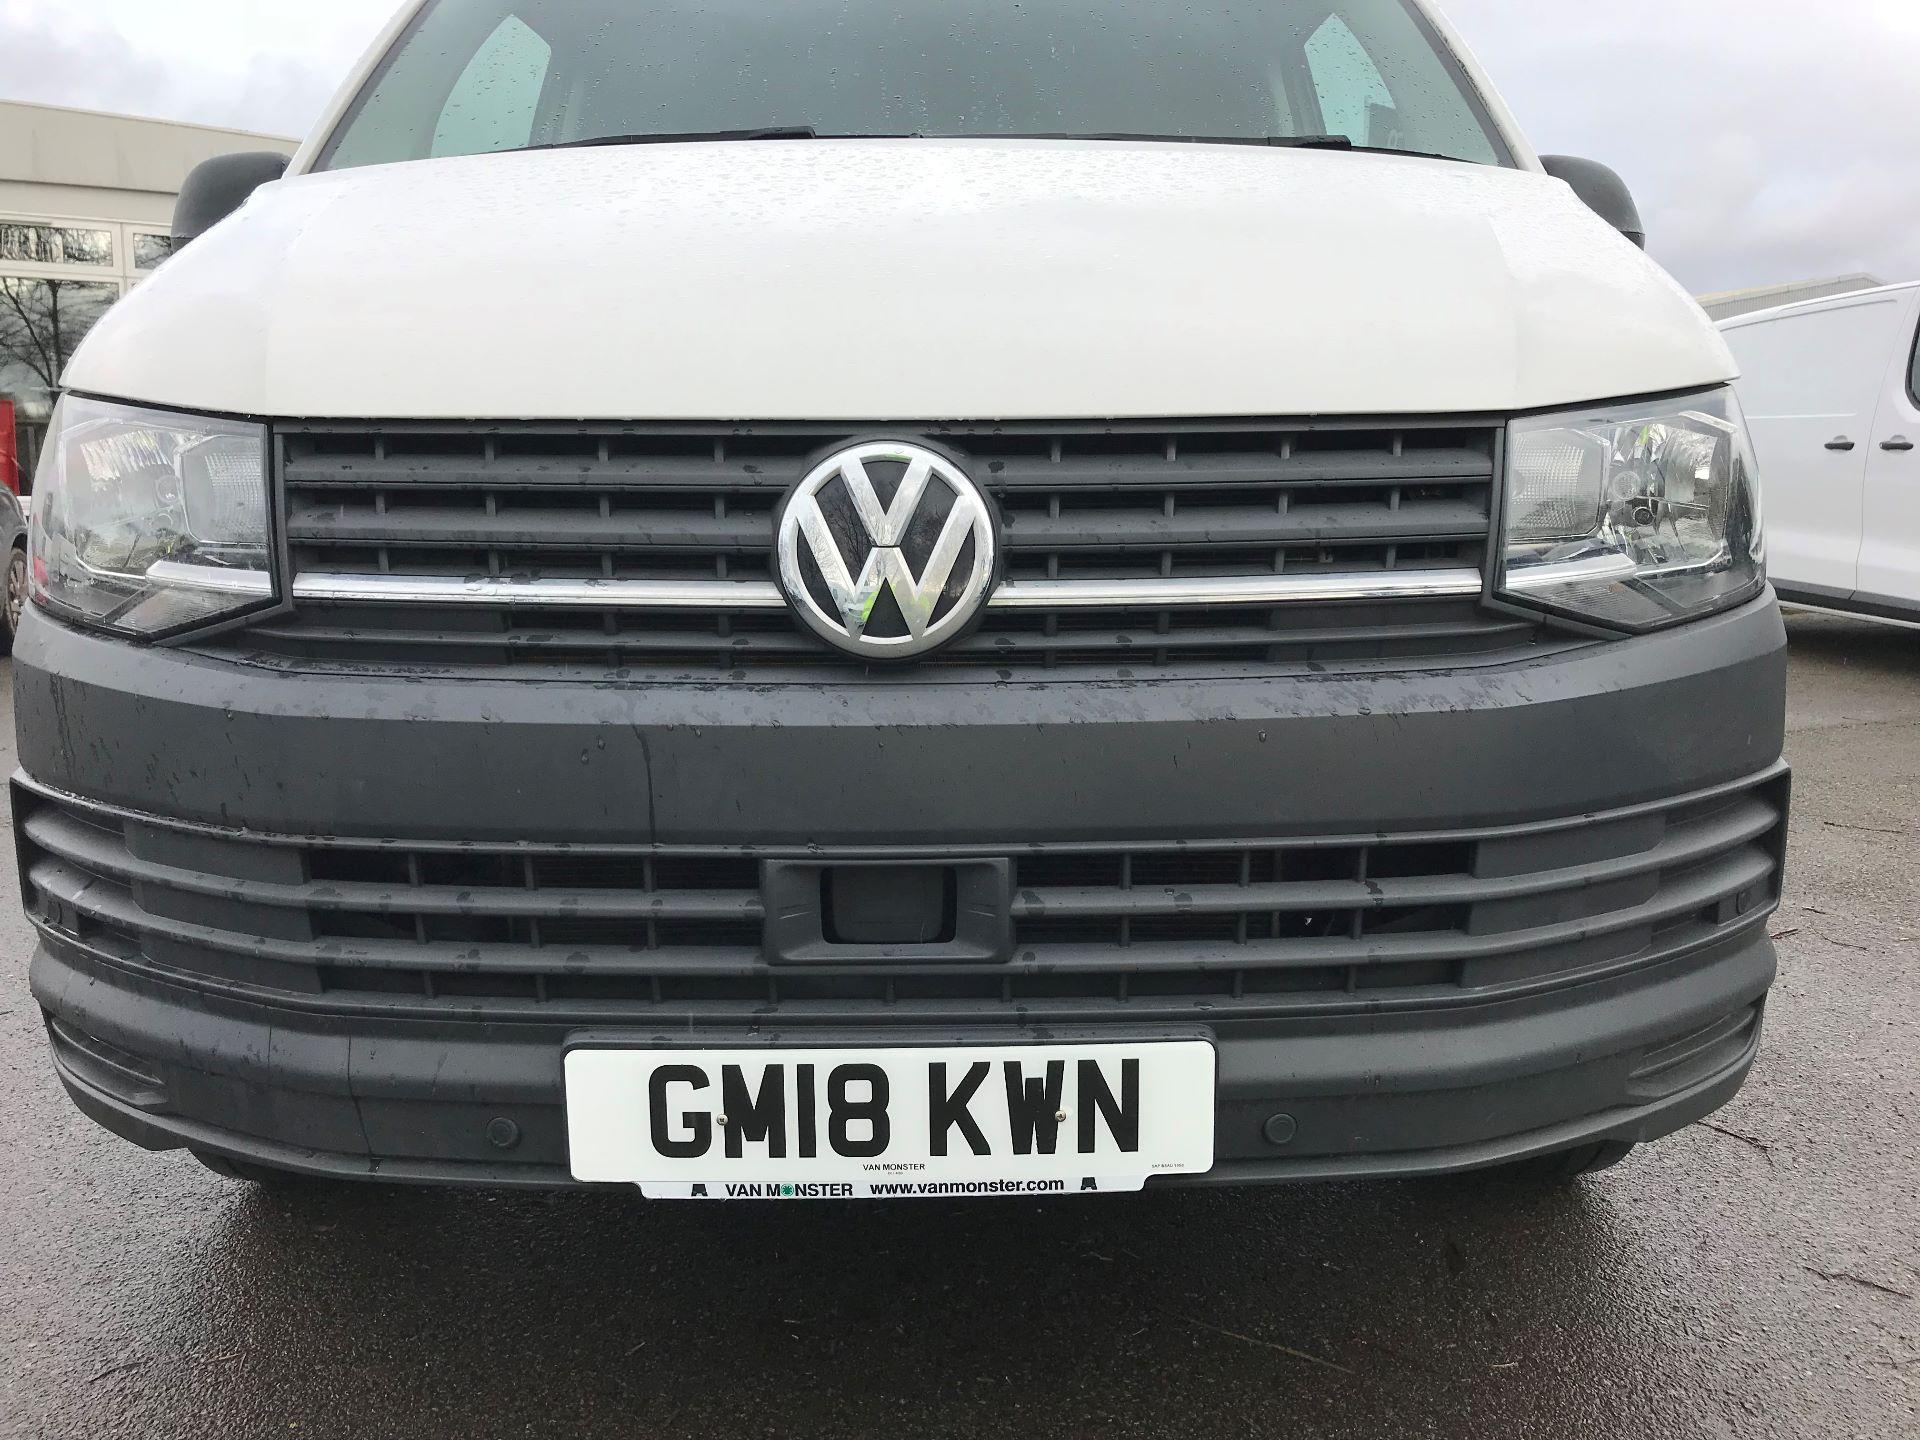 2018 Volkswagen Transporter 2.0 TDI BMT 102 STARTLINE EURO 6 (GM18KWN) Image 11